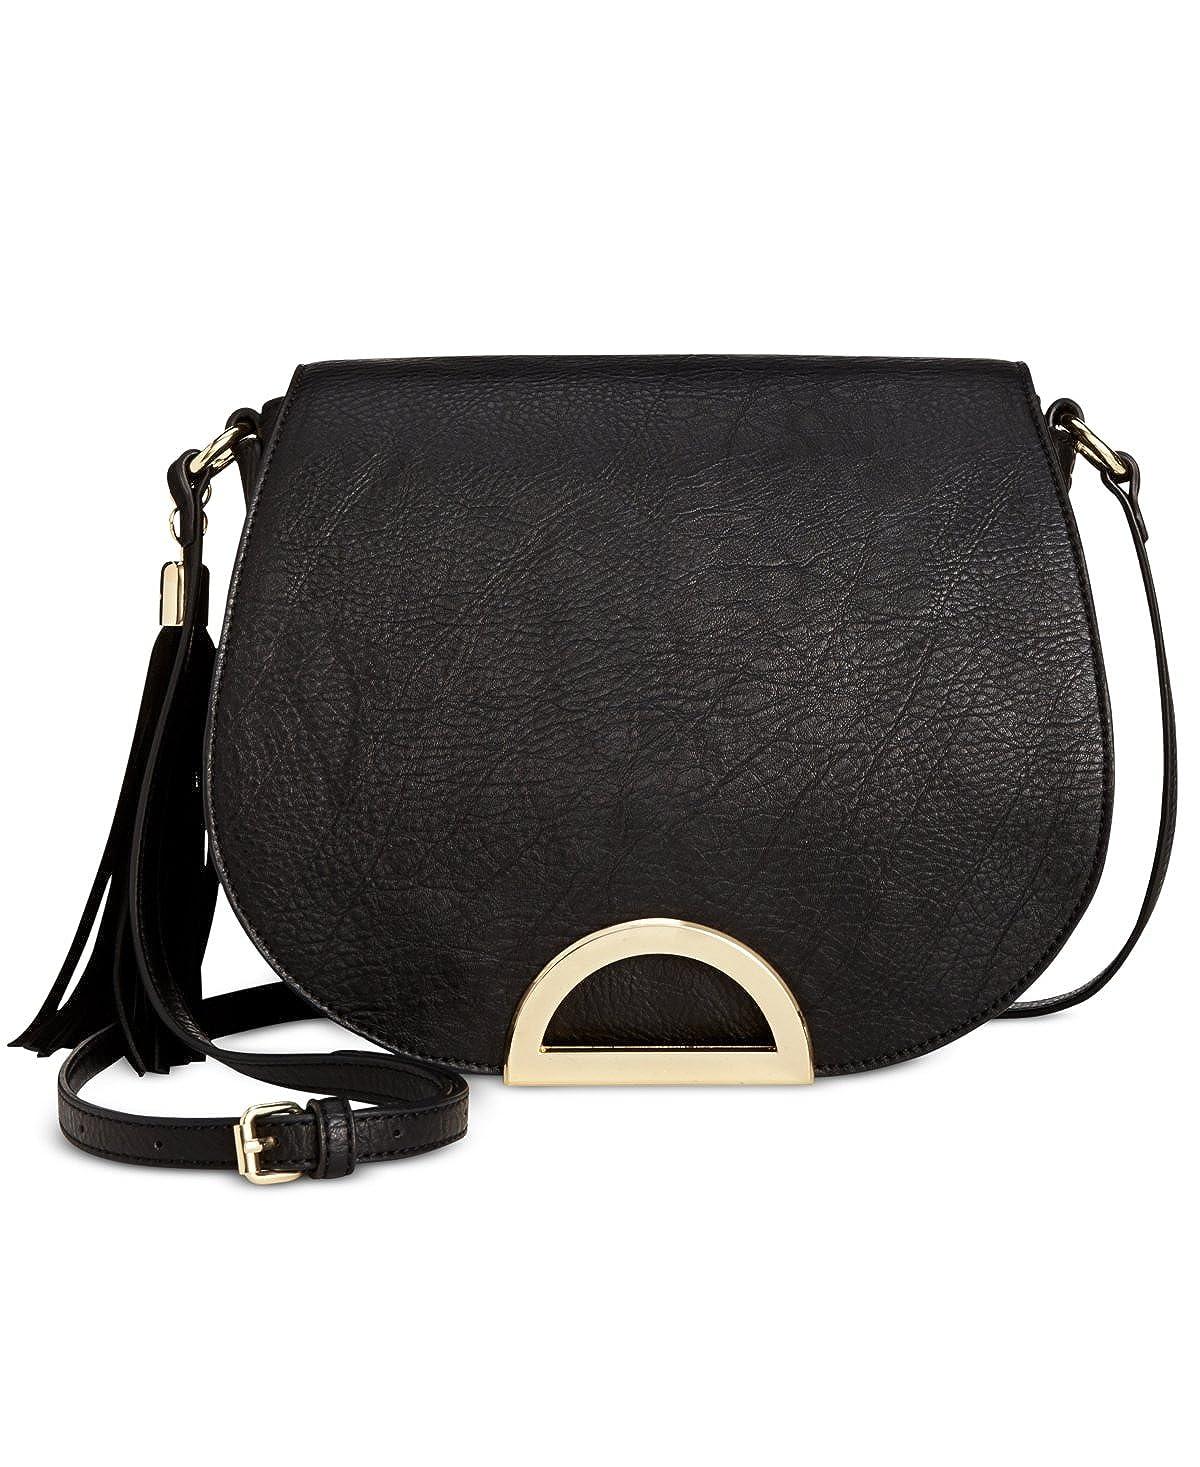 9111723d3322 Amazon.com  INC International Concepts Maraa Ring Saddle Bag